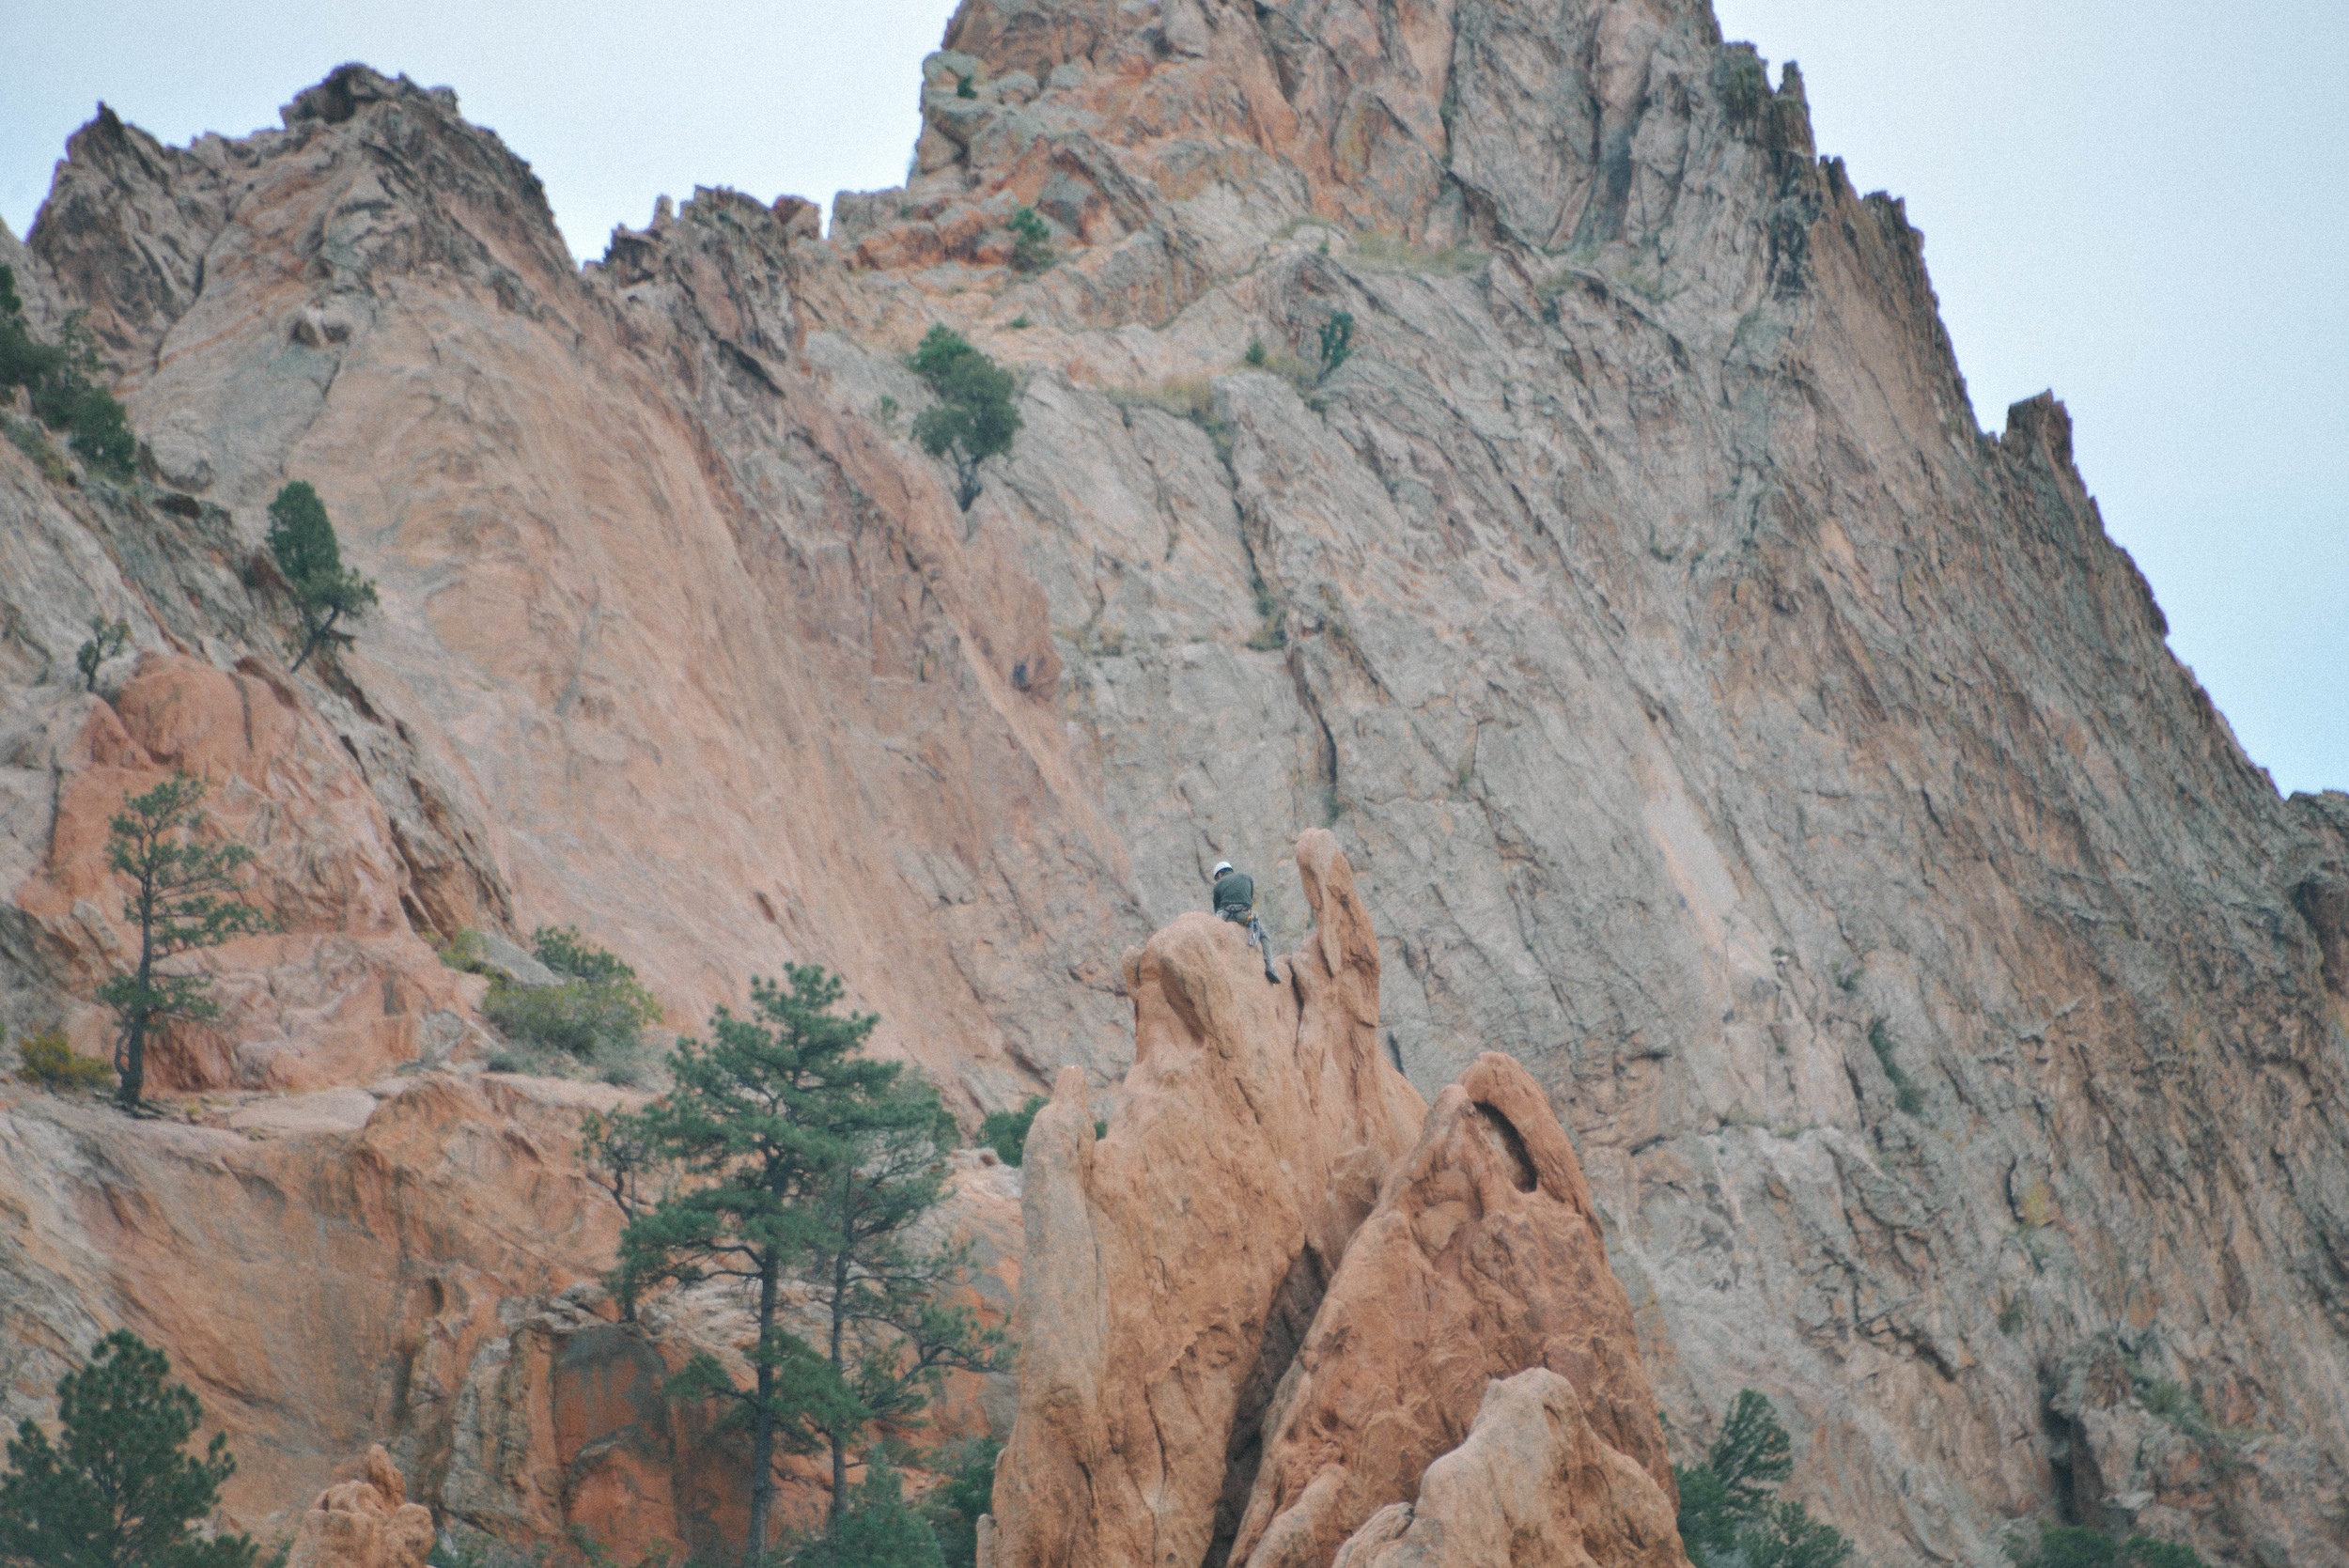 Rock climber sitting high.